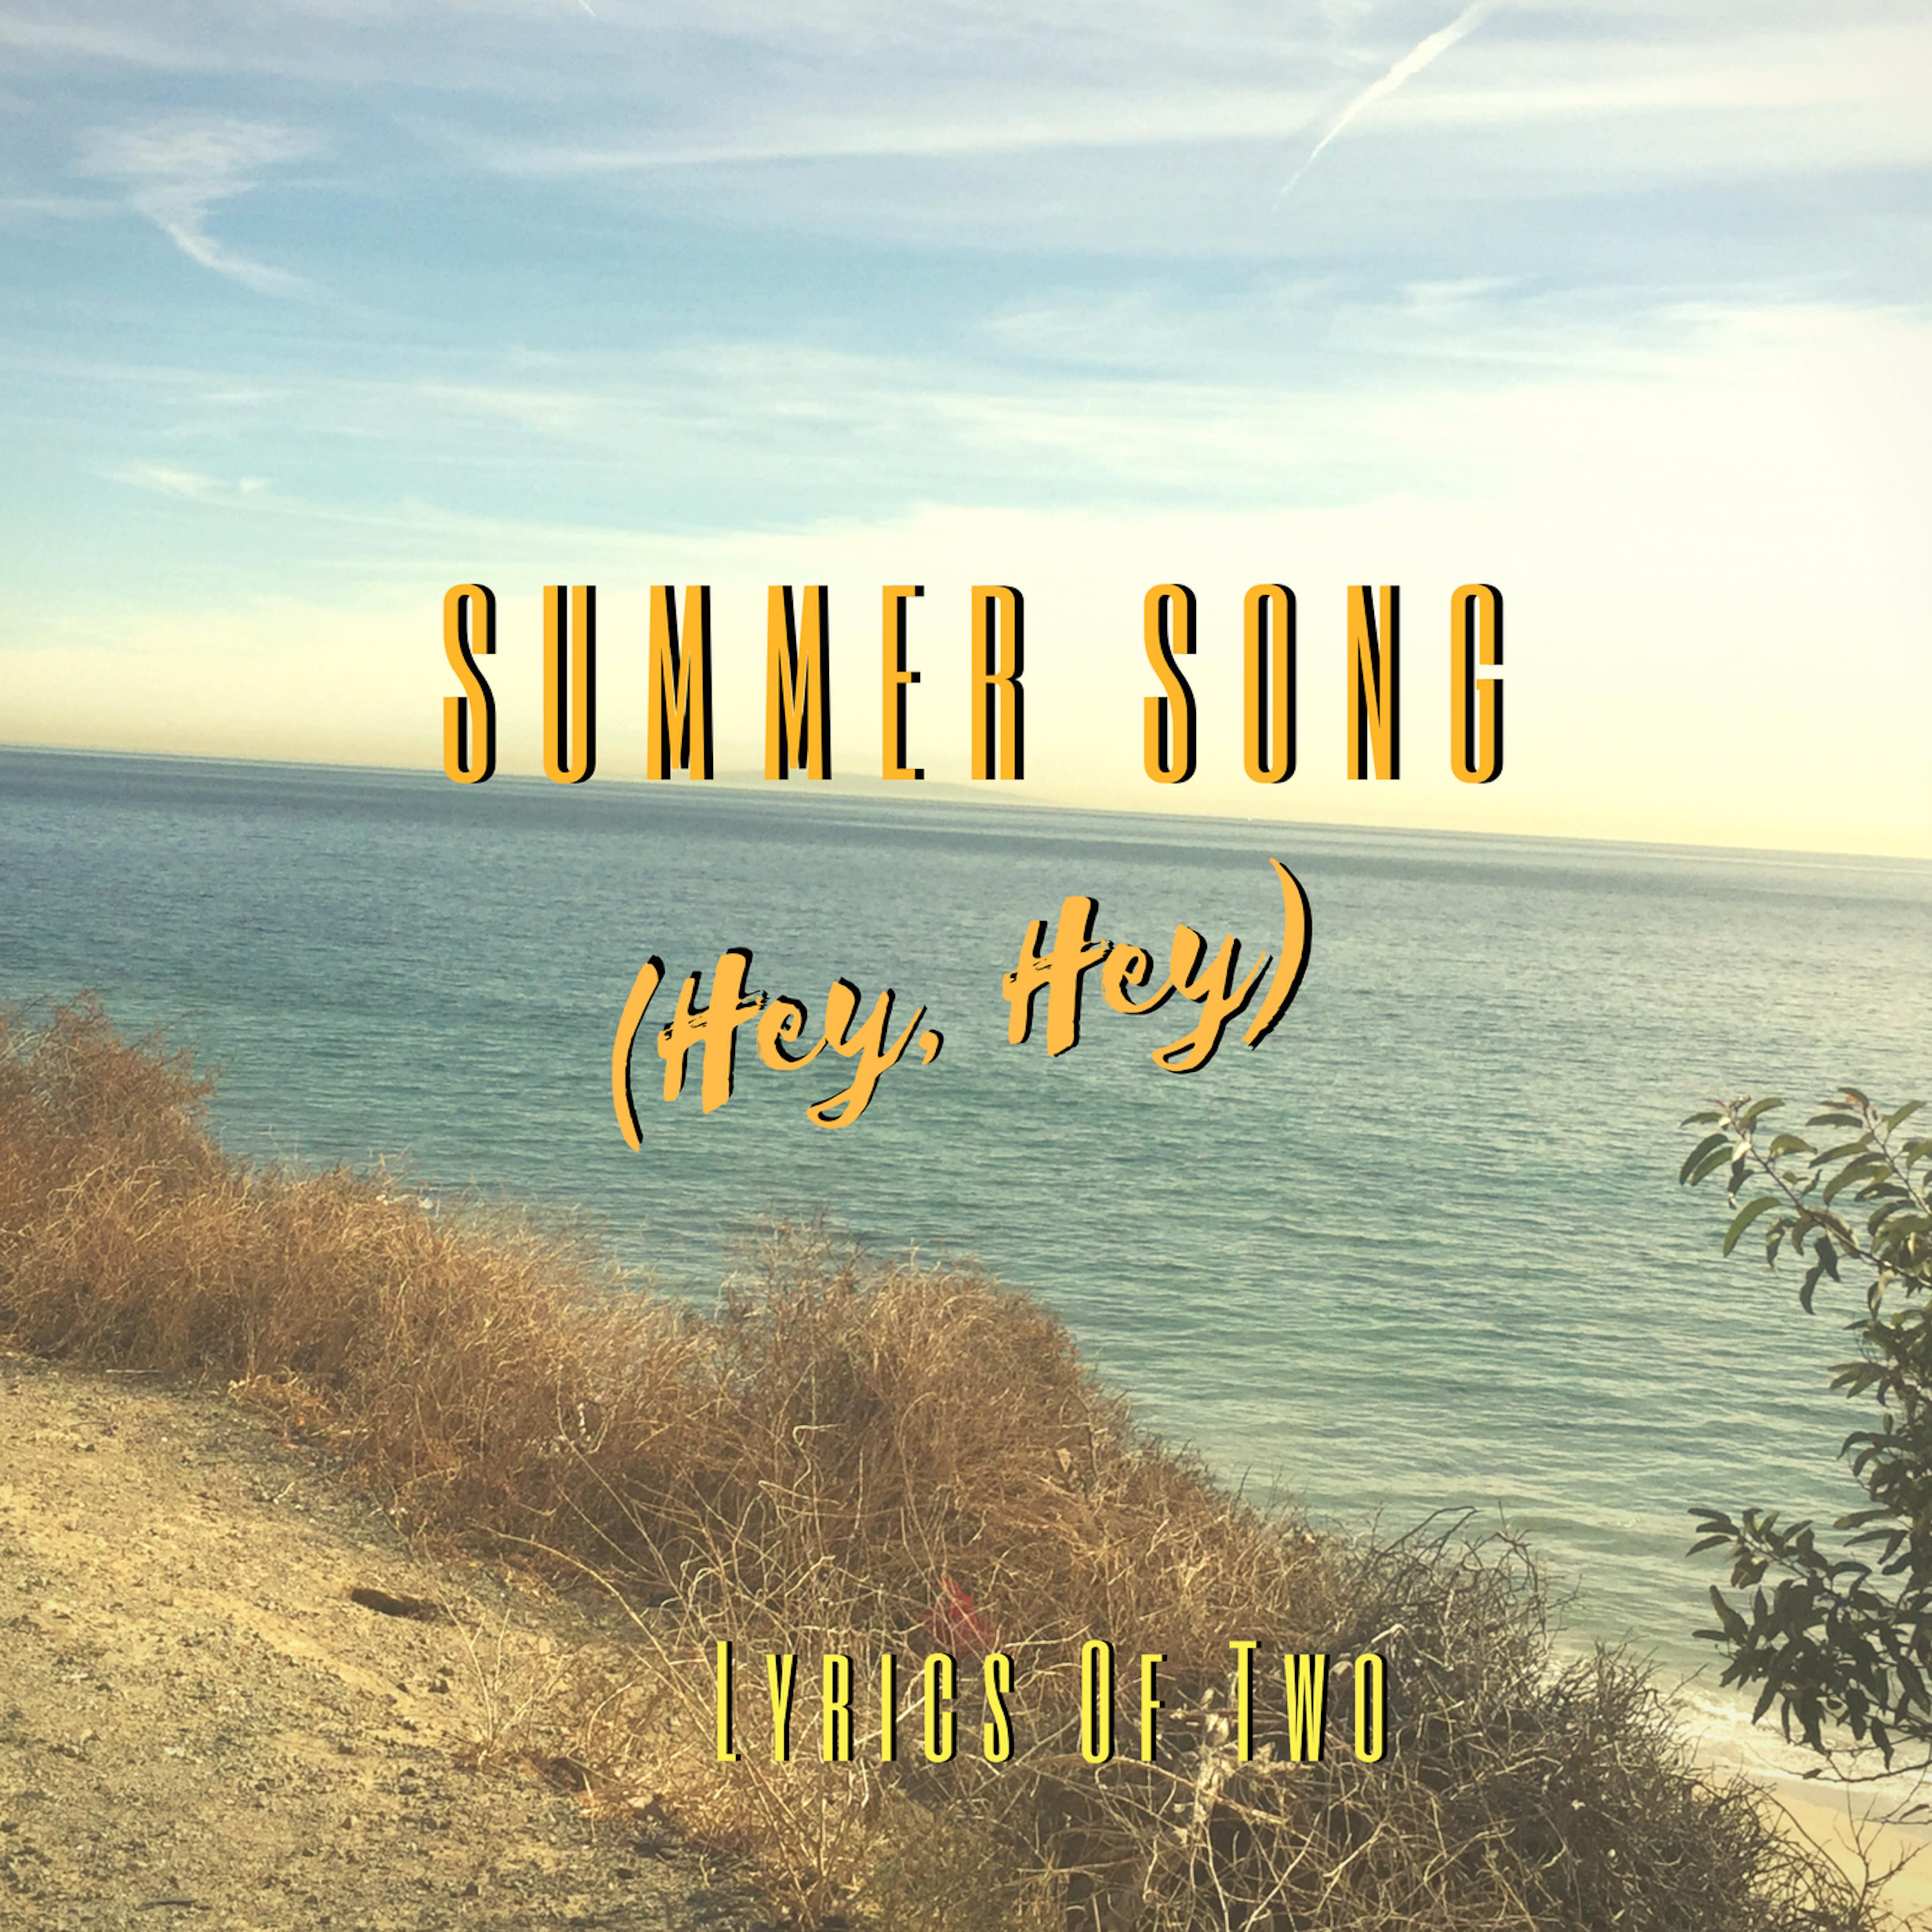 Summer Song (Hey_Hey) Album Cover